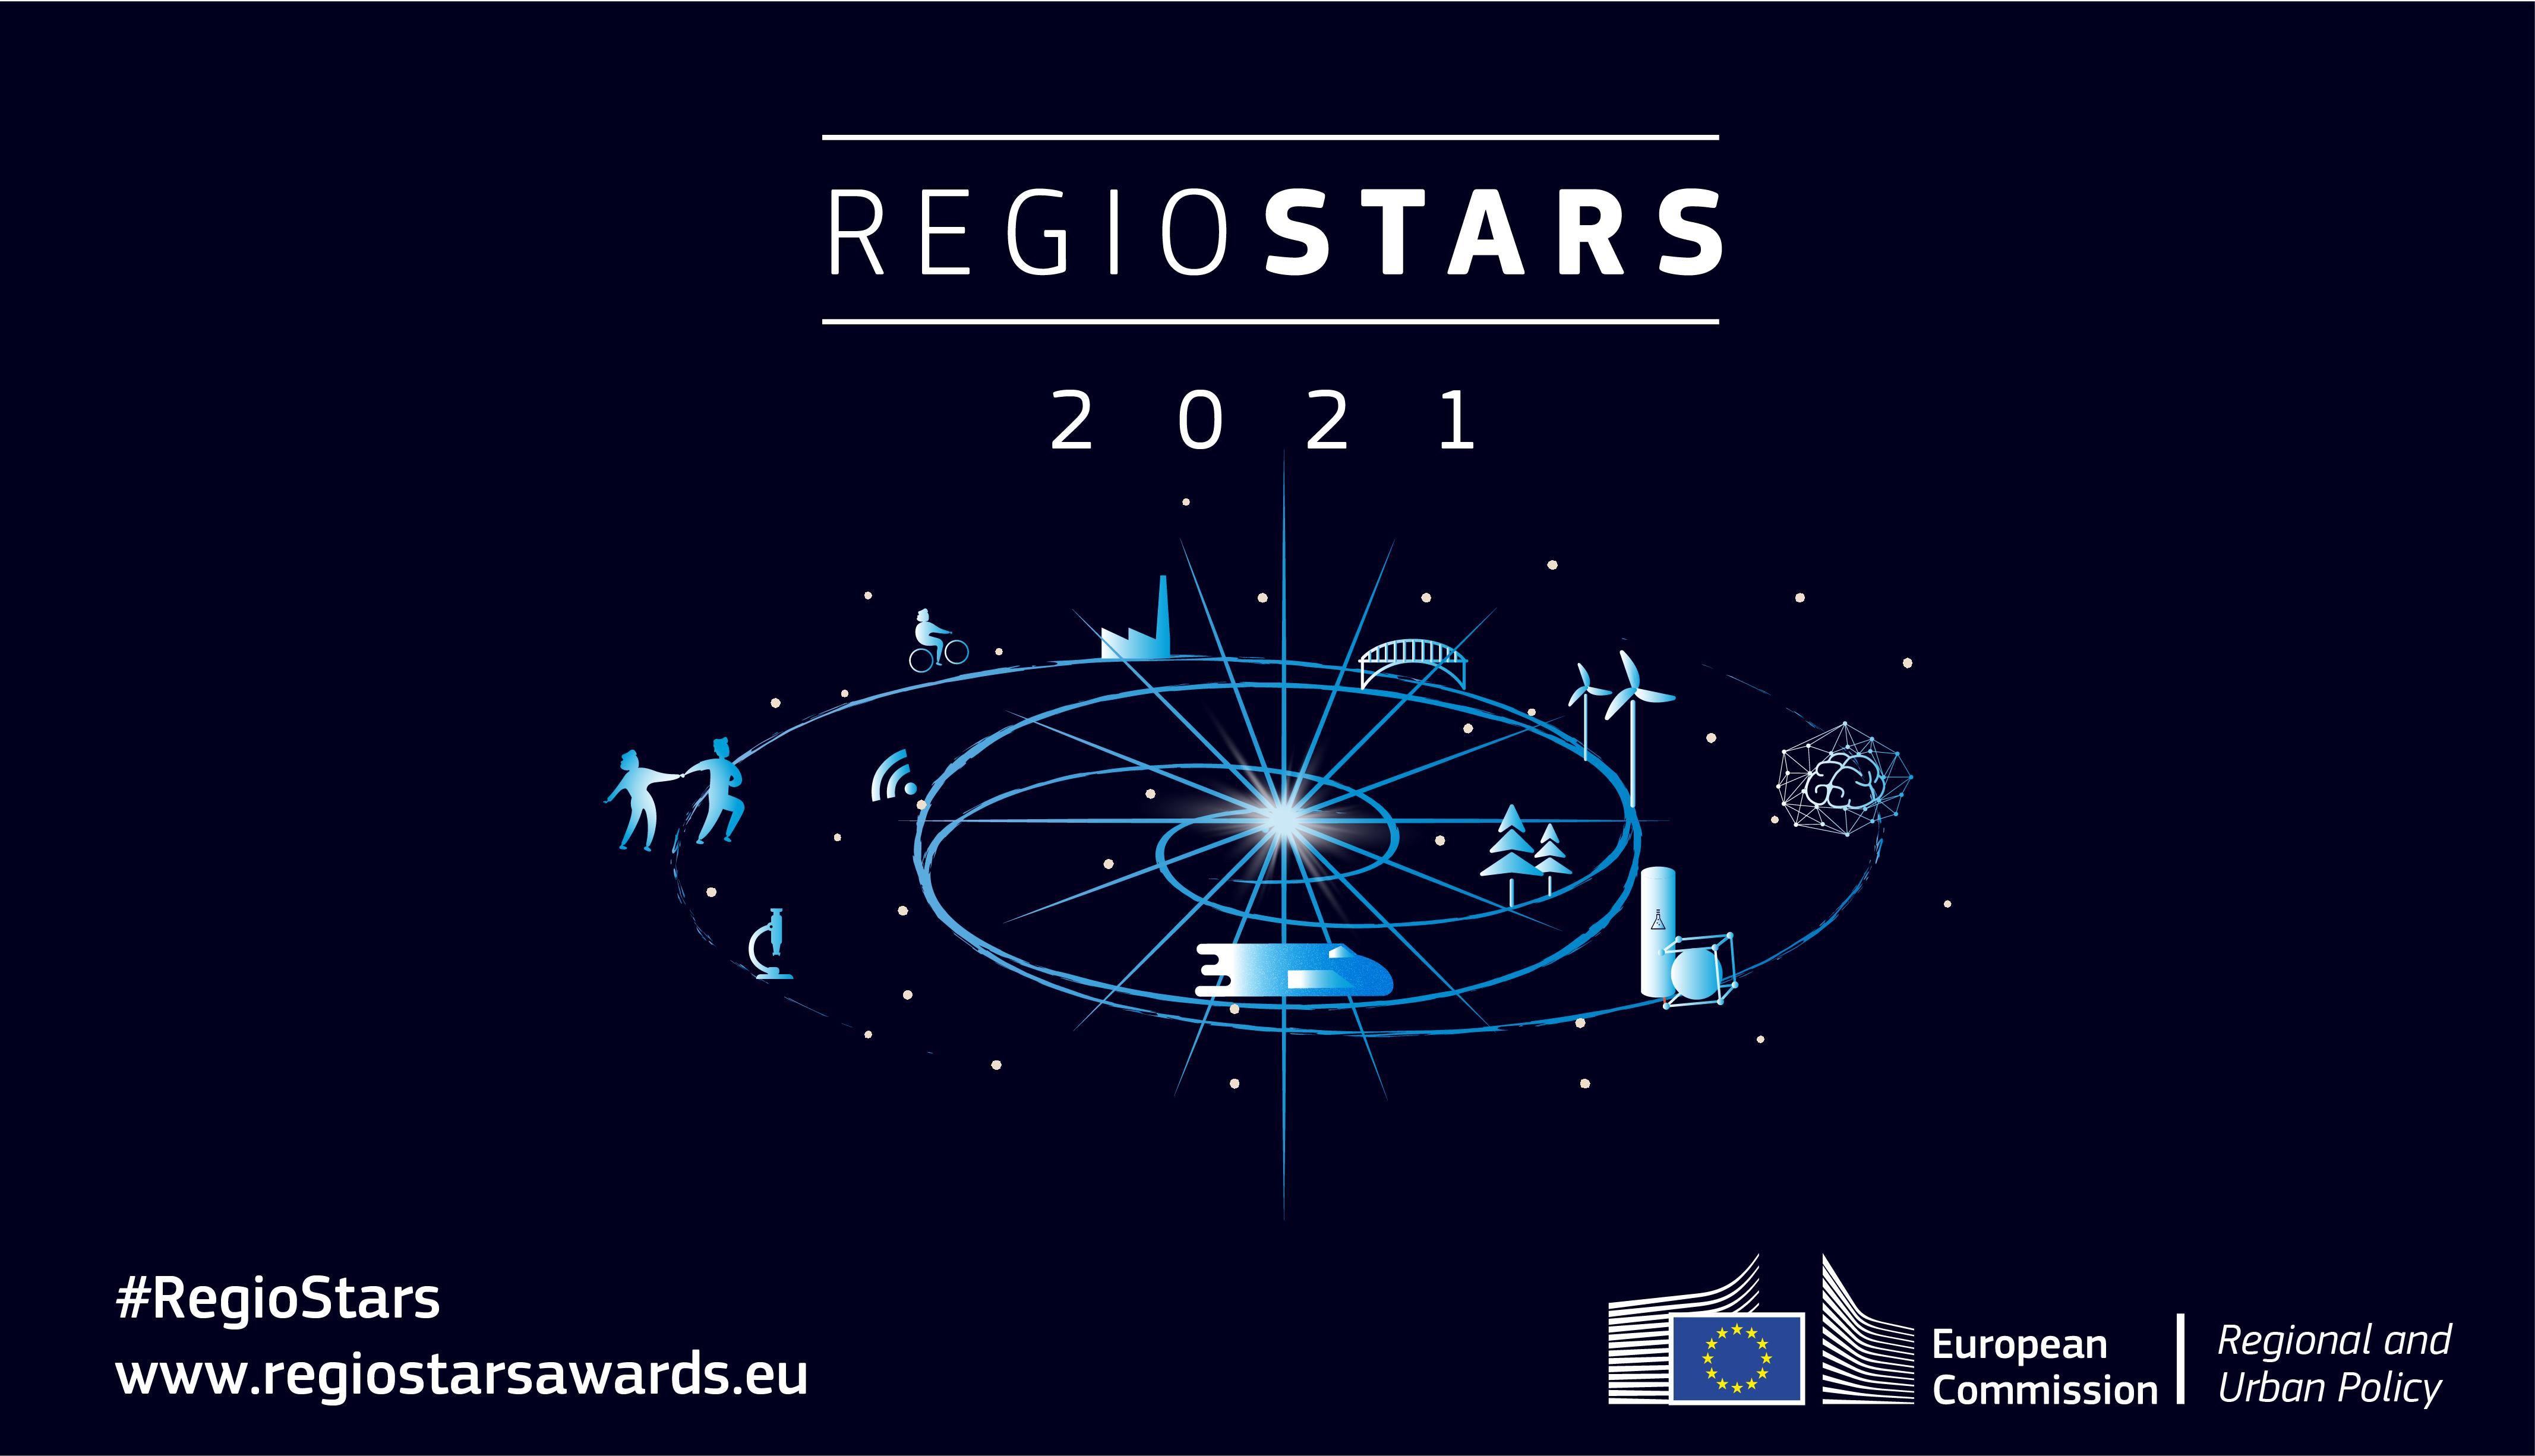 regiostars 2021